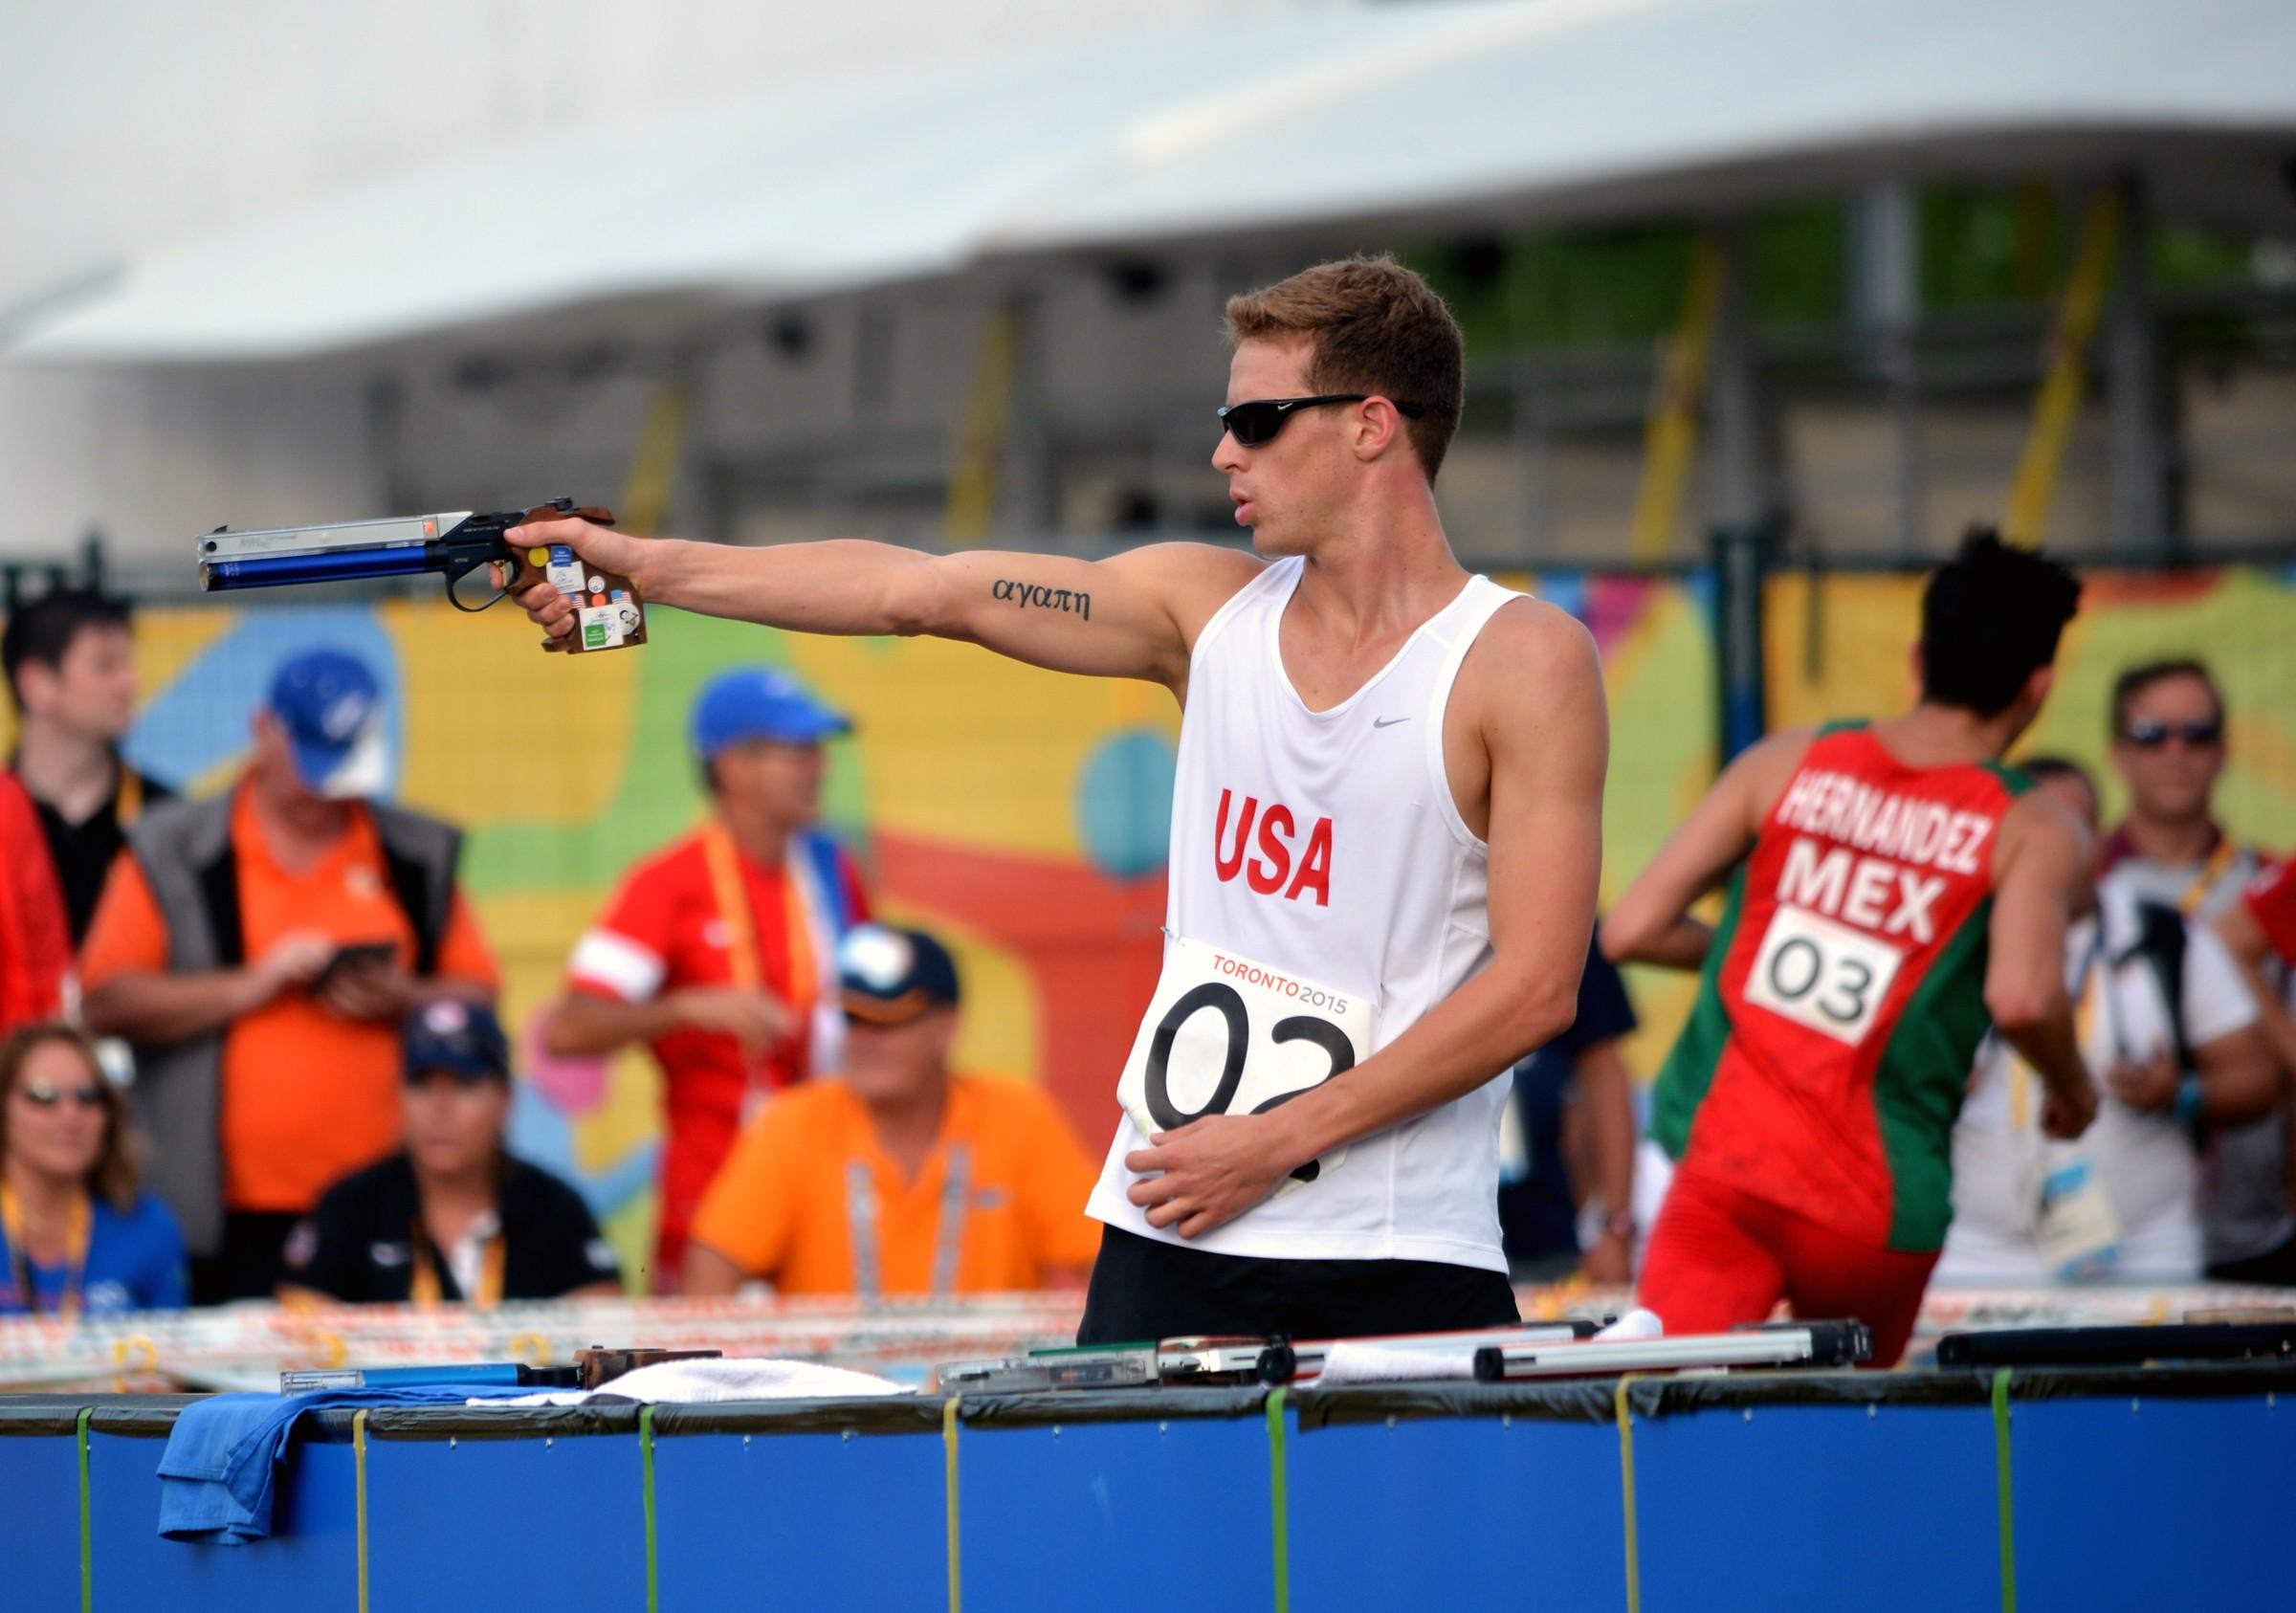 Pentathlon. Modern pentathlon: five sports excellence in one